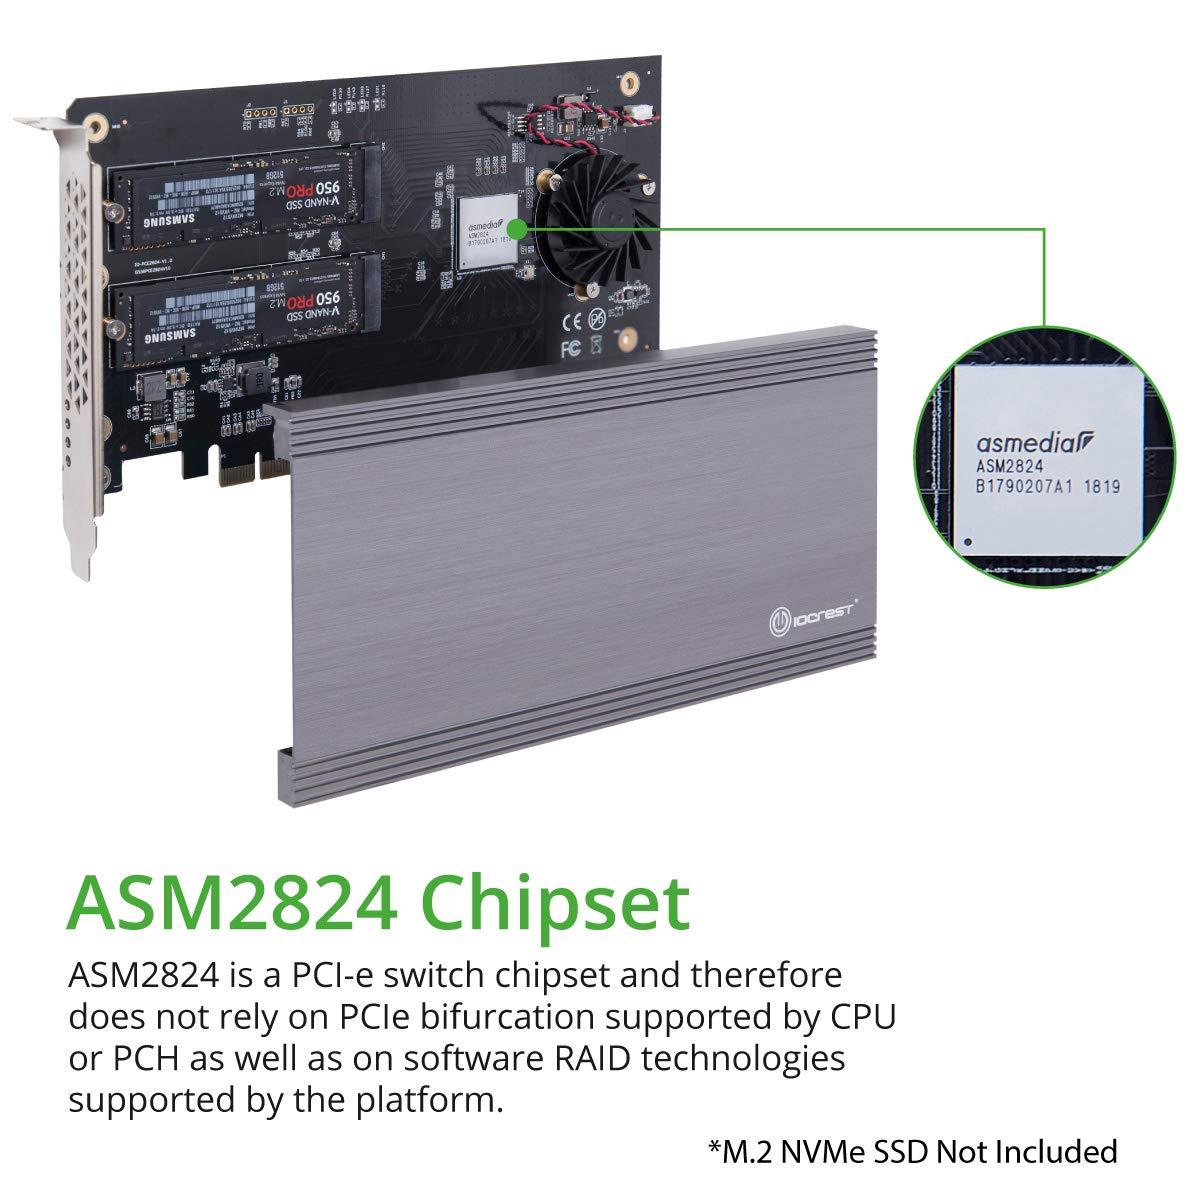 I/O CREST SI-PEX40129 Dual M 2 NVMe Ports to PCIe 3 0 x16